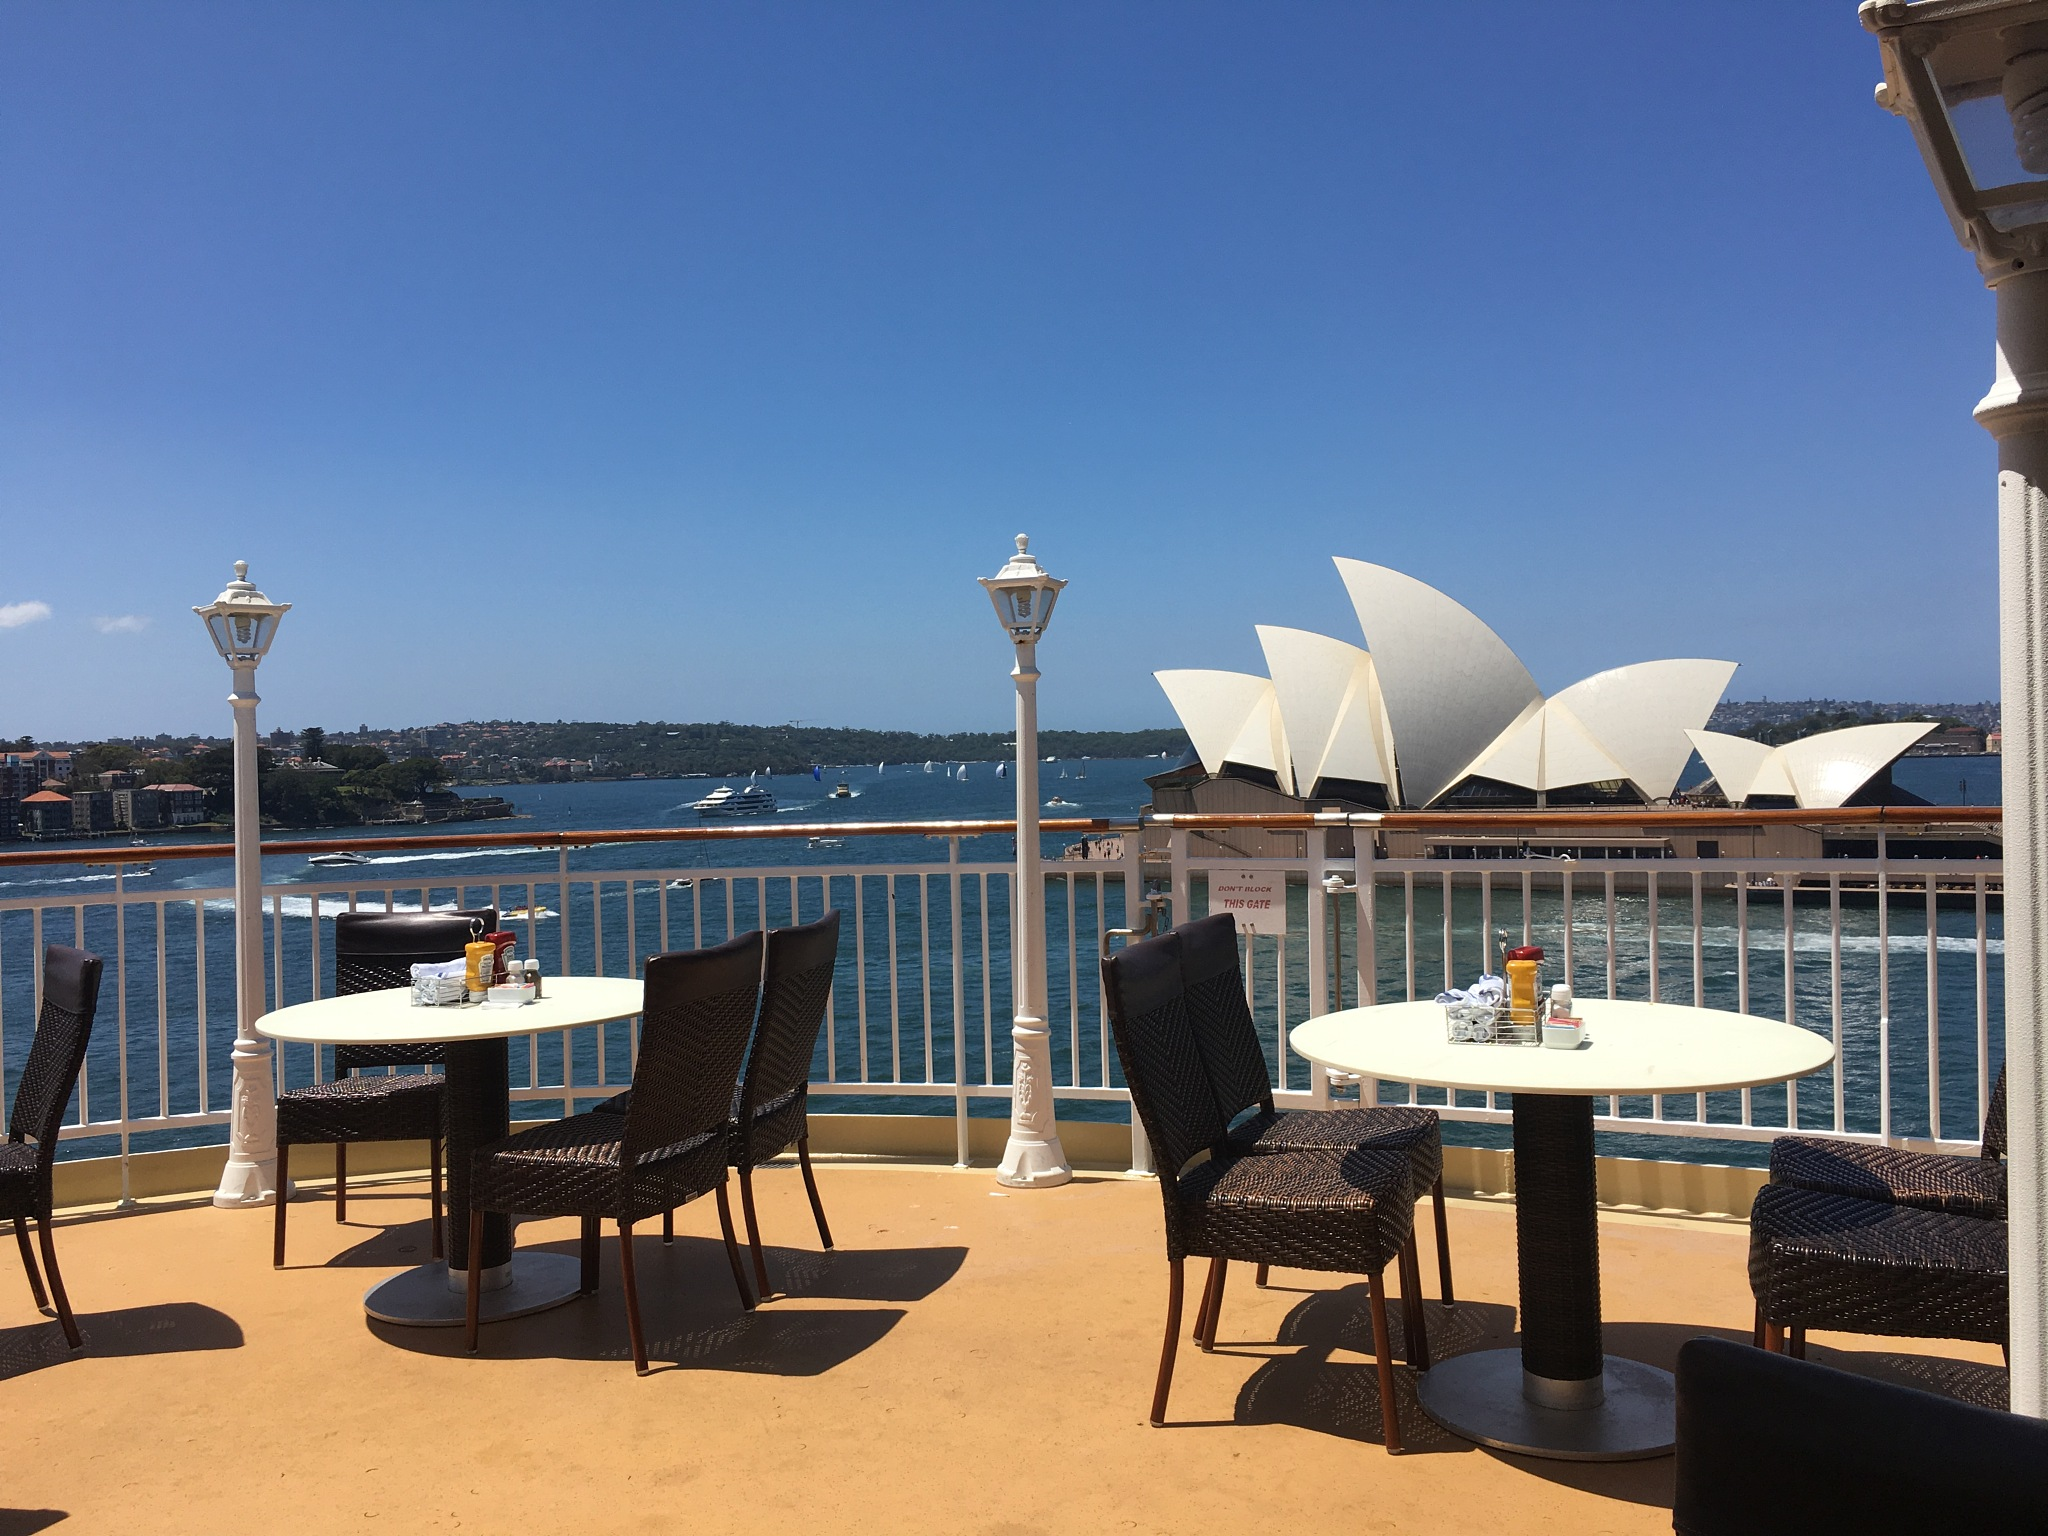 Deck 12 in Sydney by ronmac777